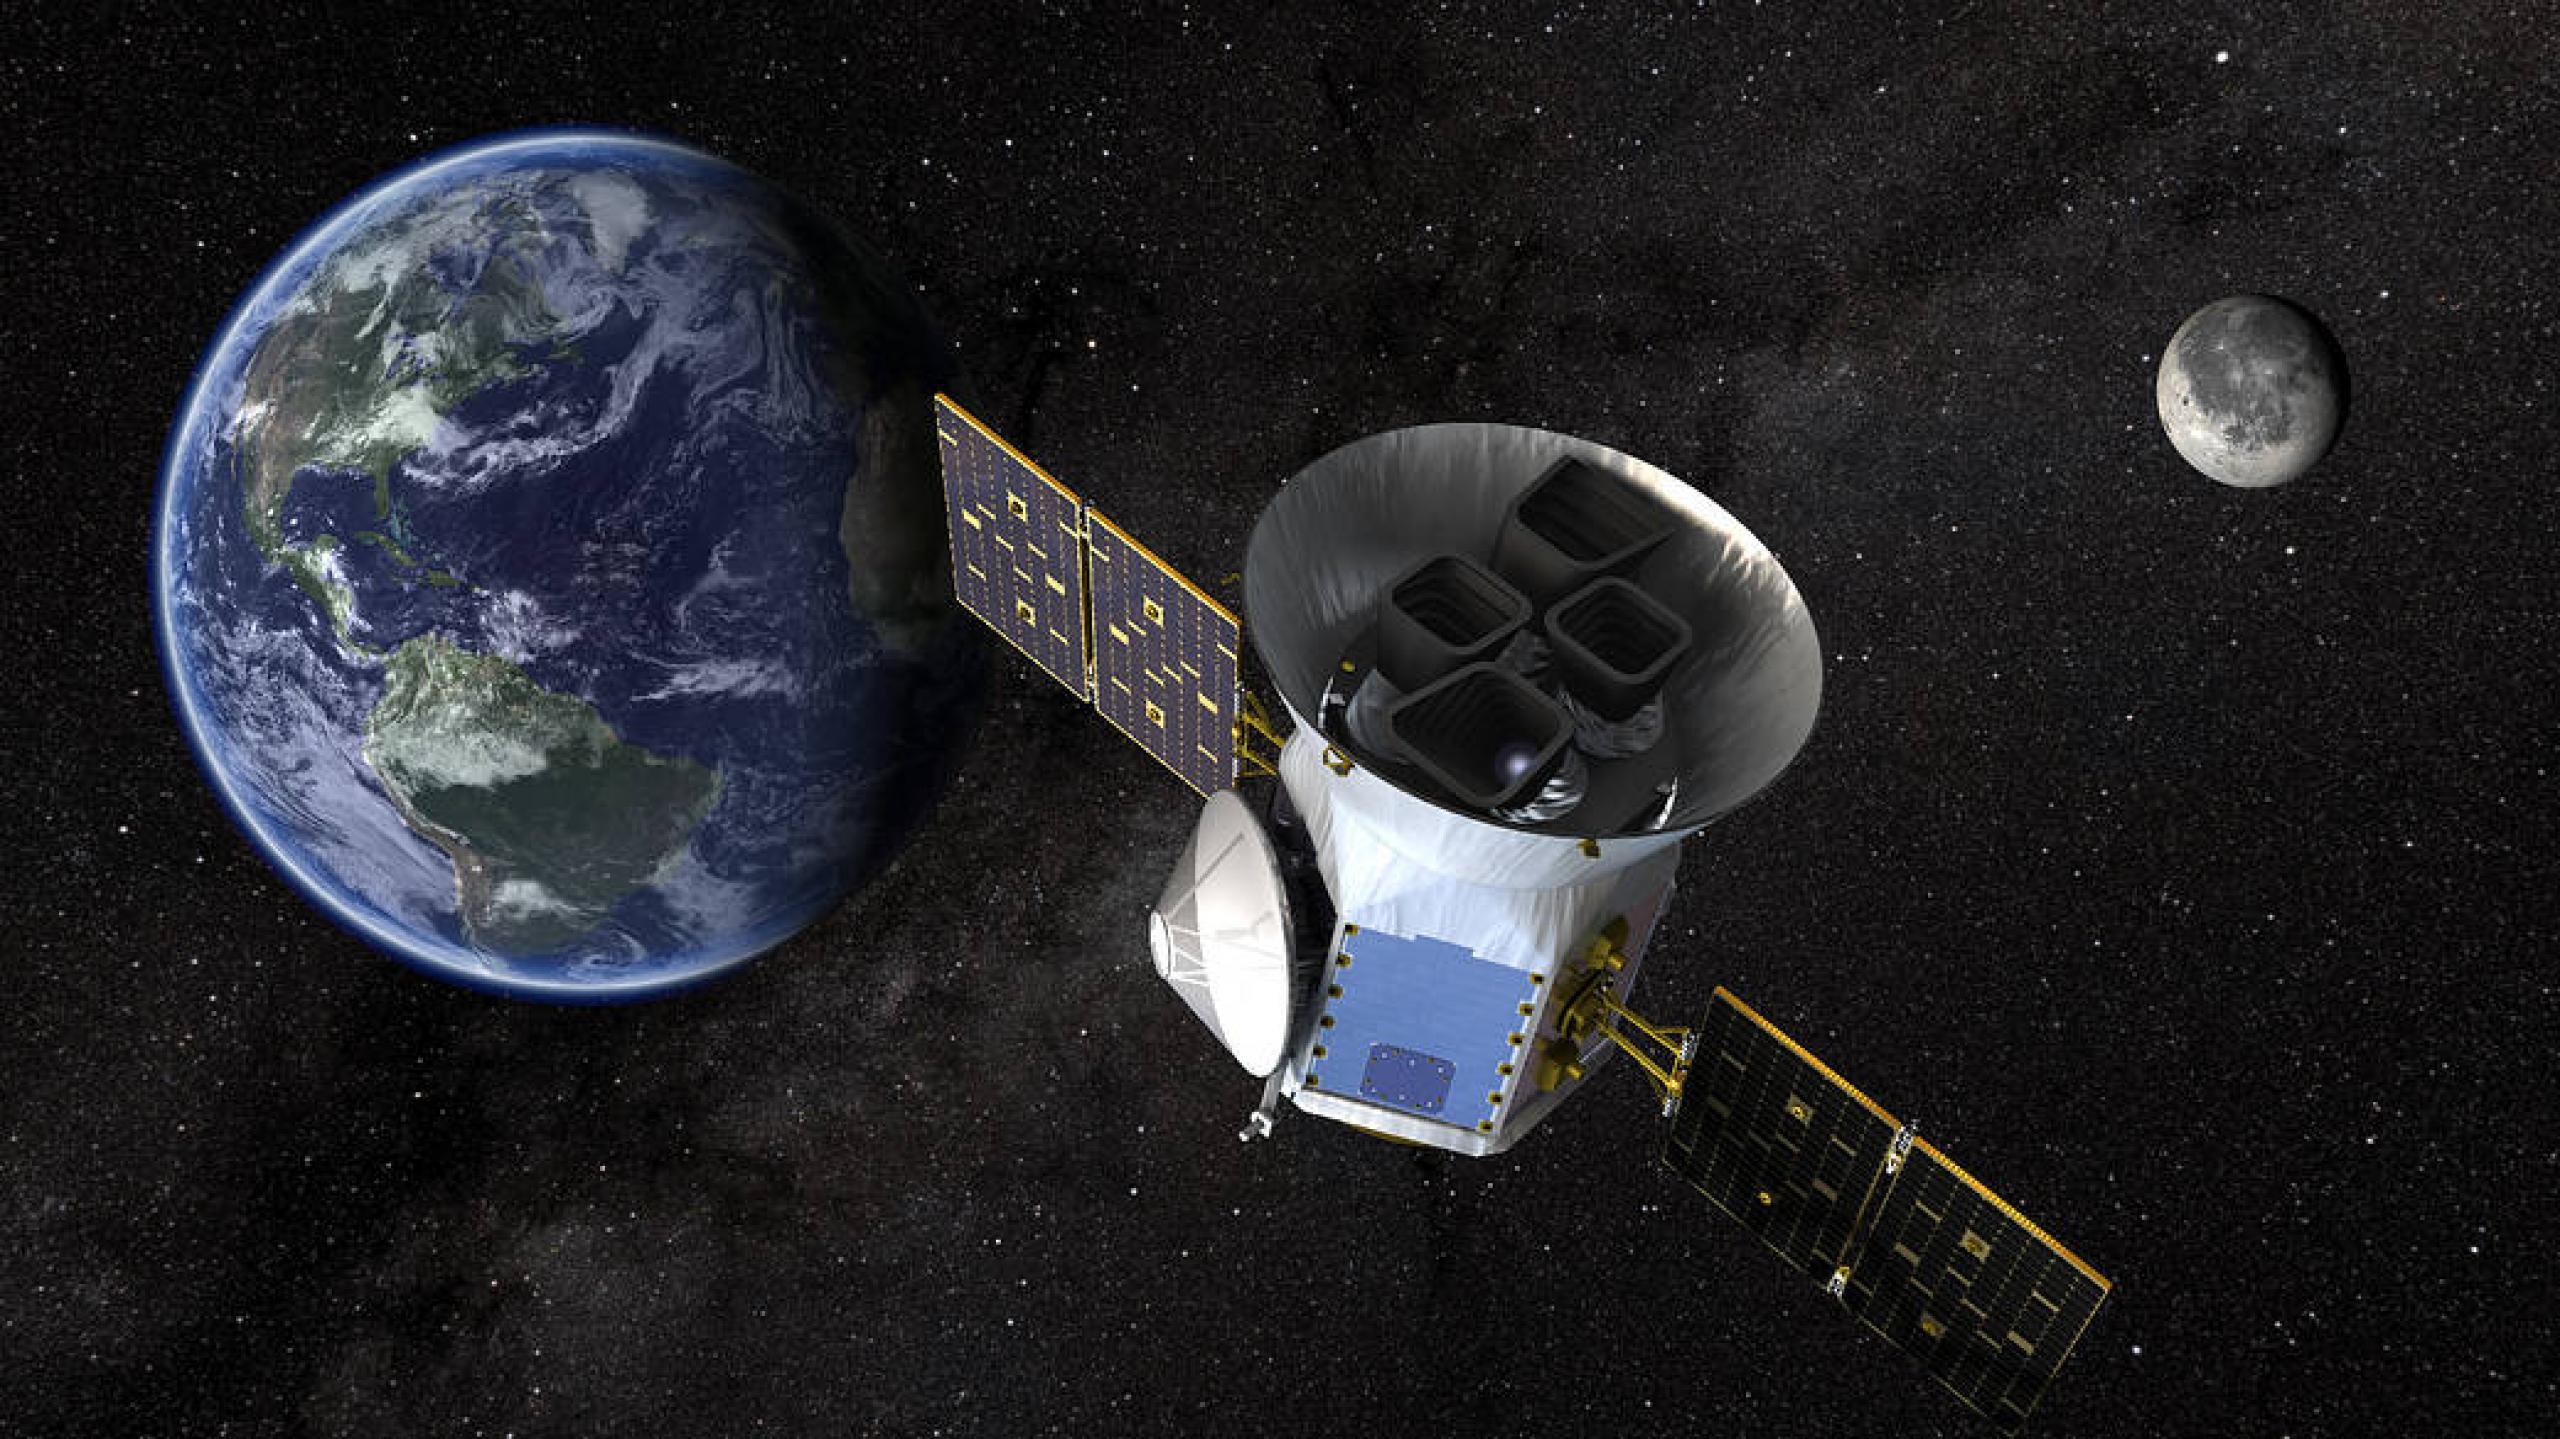 Artist concept of TESS satellite